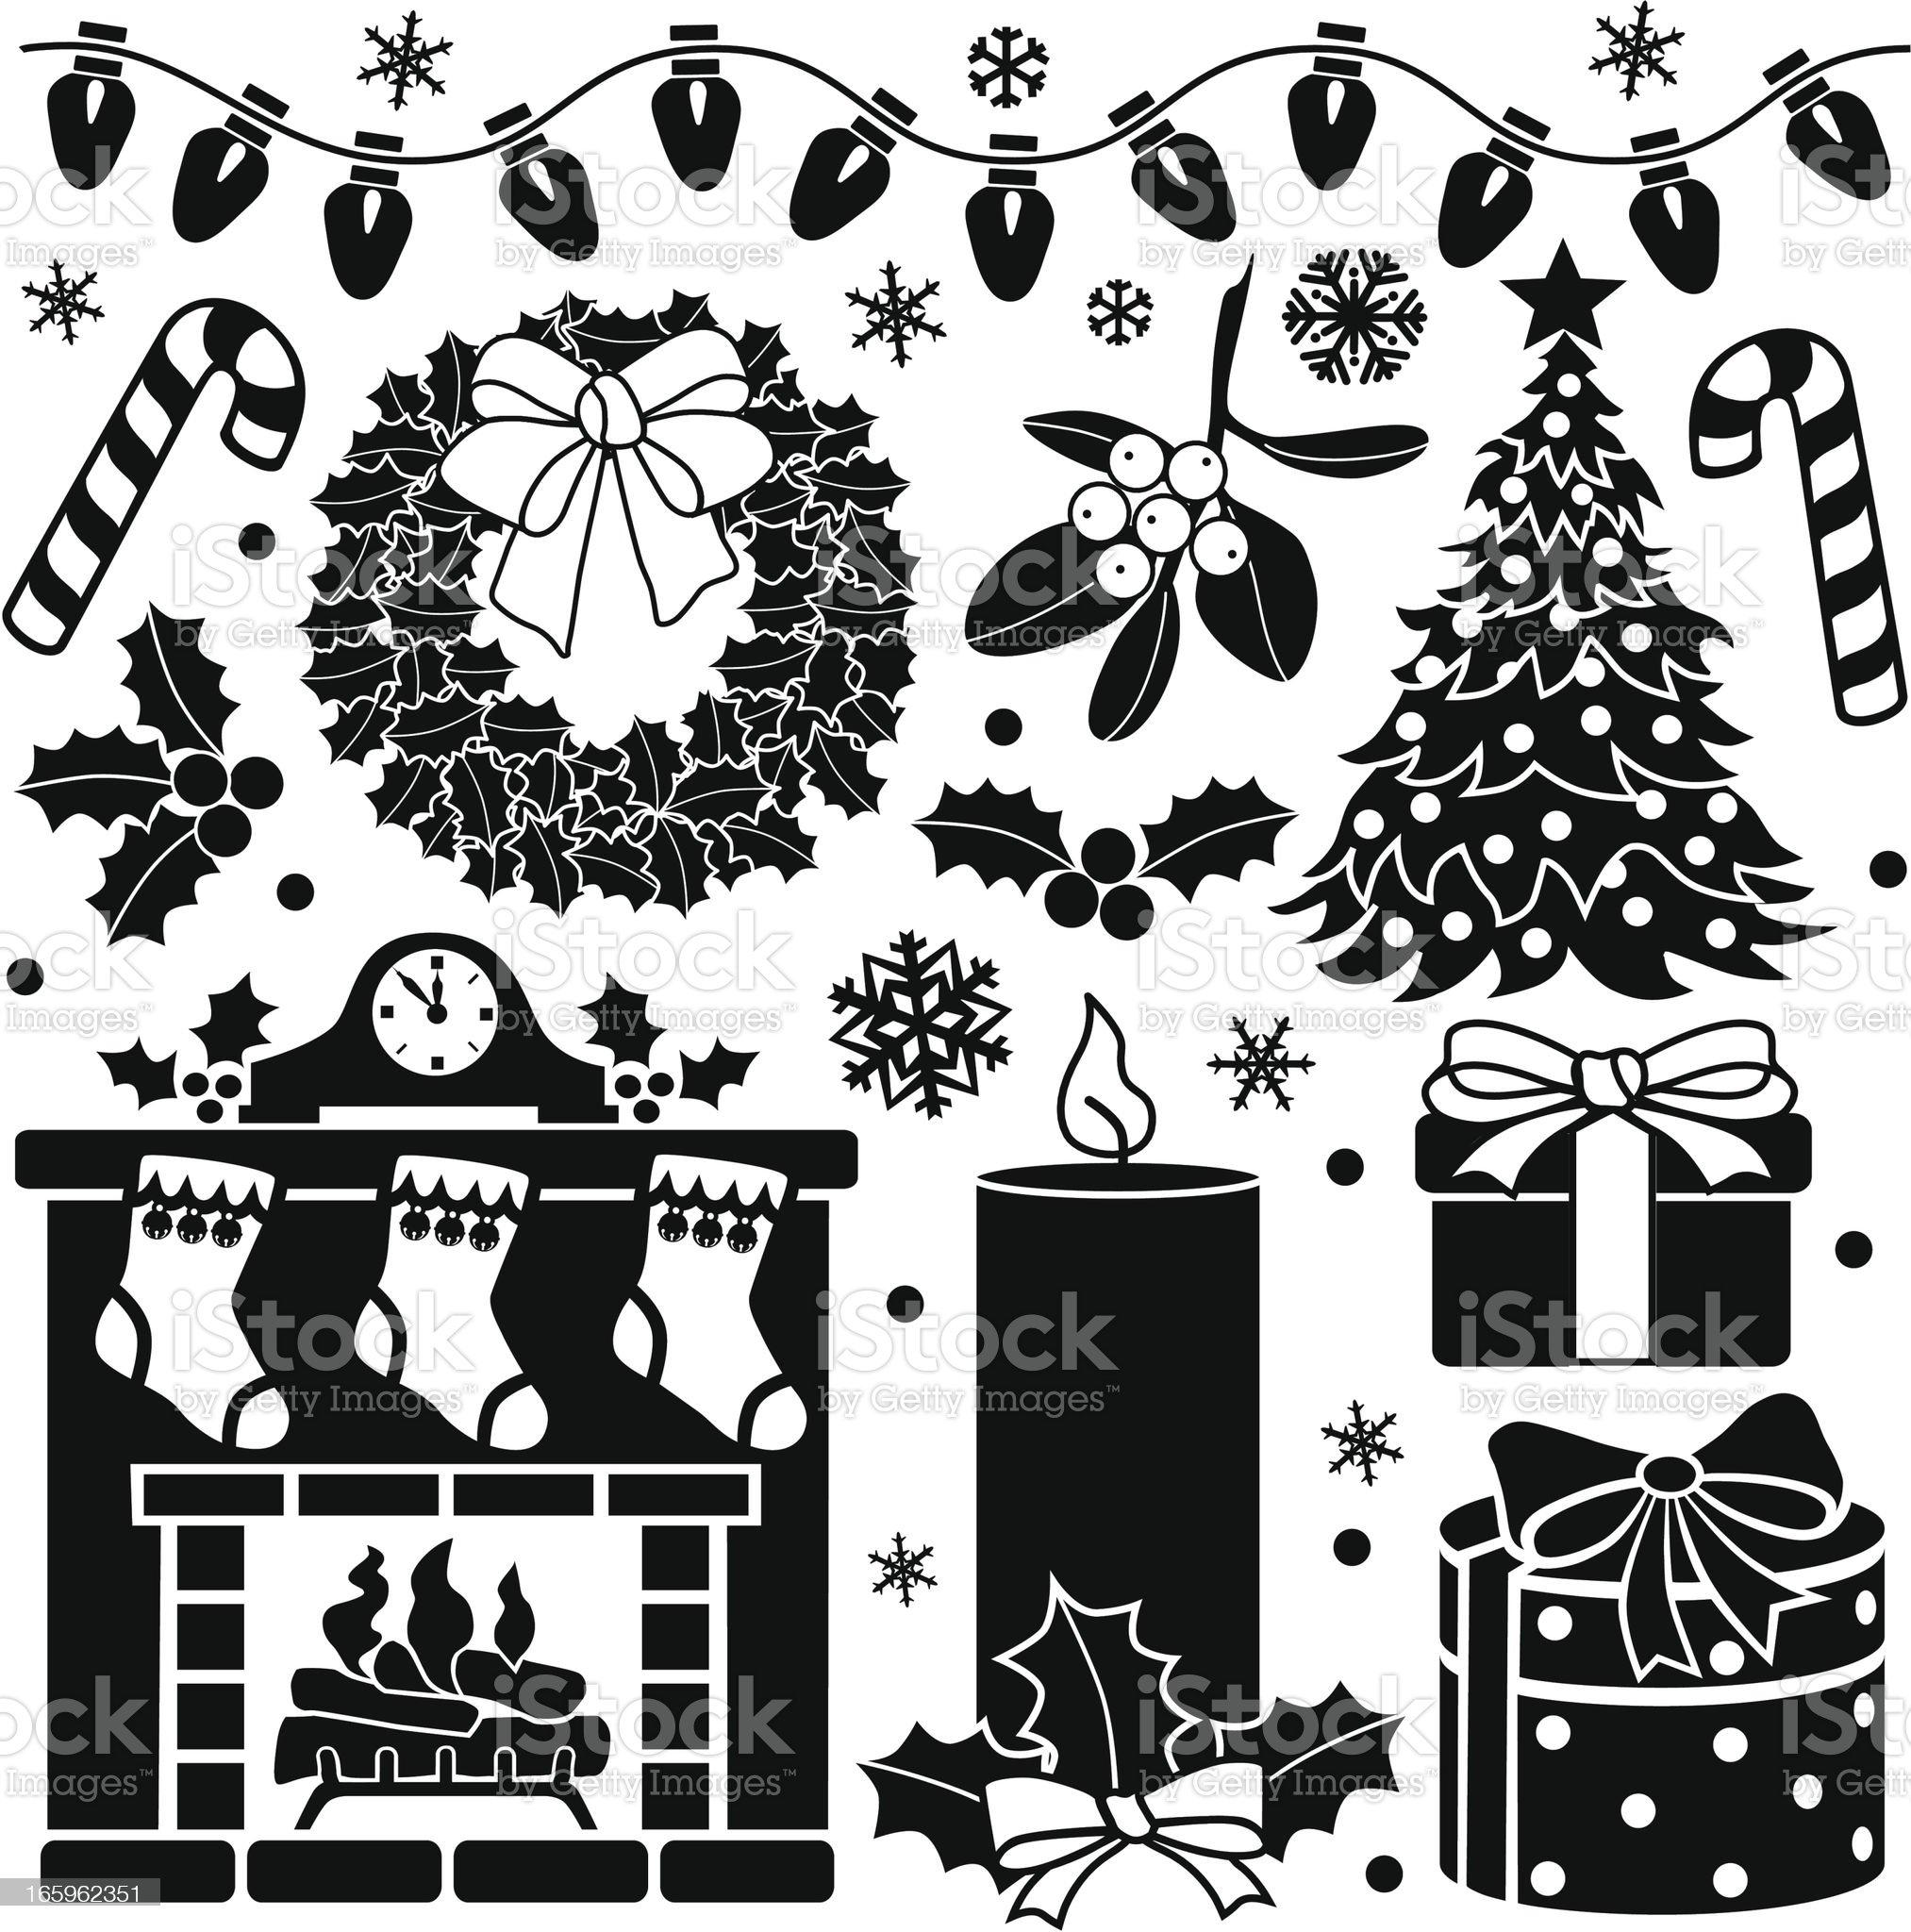 Christmas design elements royalty-free stock vector art